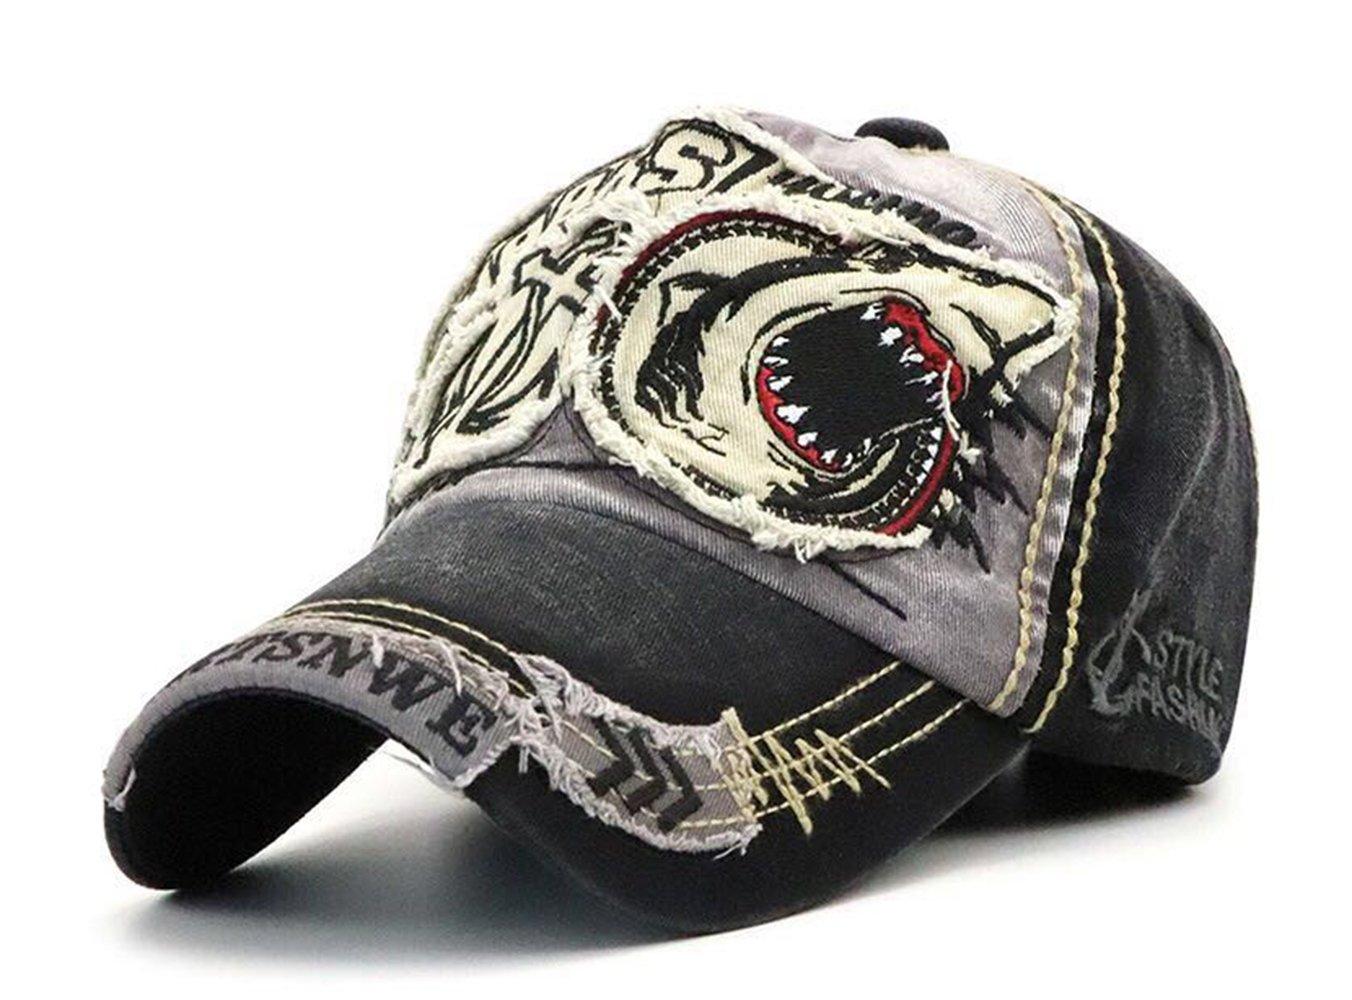 8065b8a29 FENGFA Mens Vintage Distressed Baseball Cap Snapback Outdoor Sports Cap  Trucker Hat